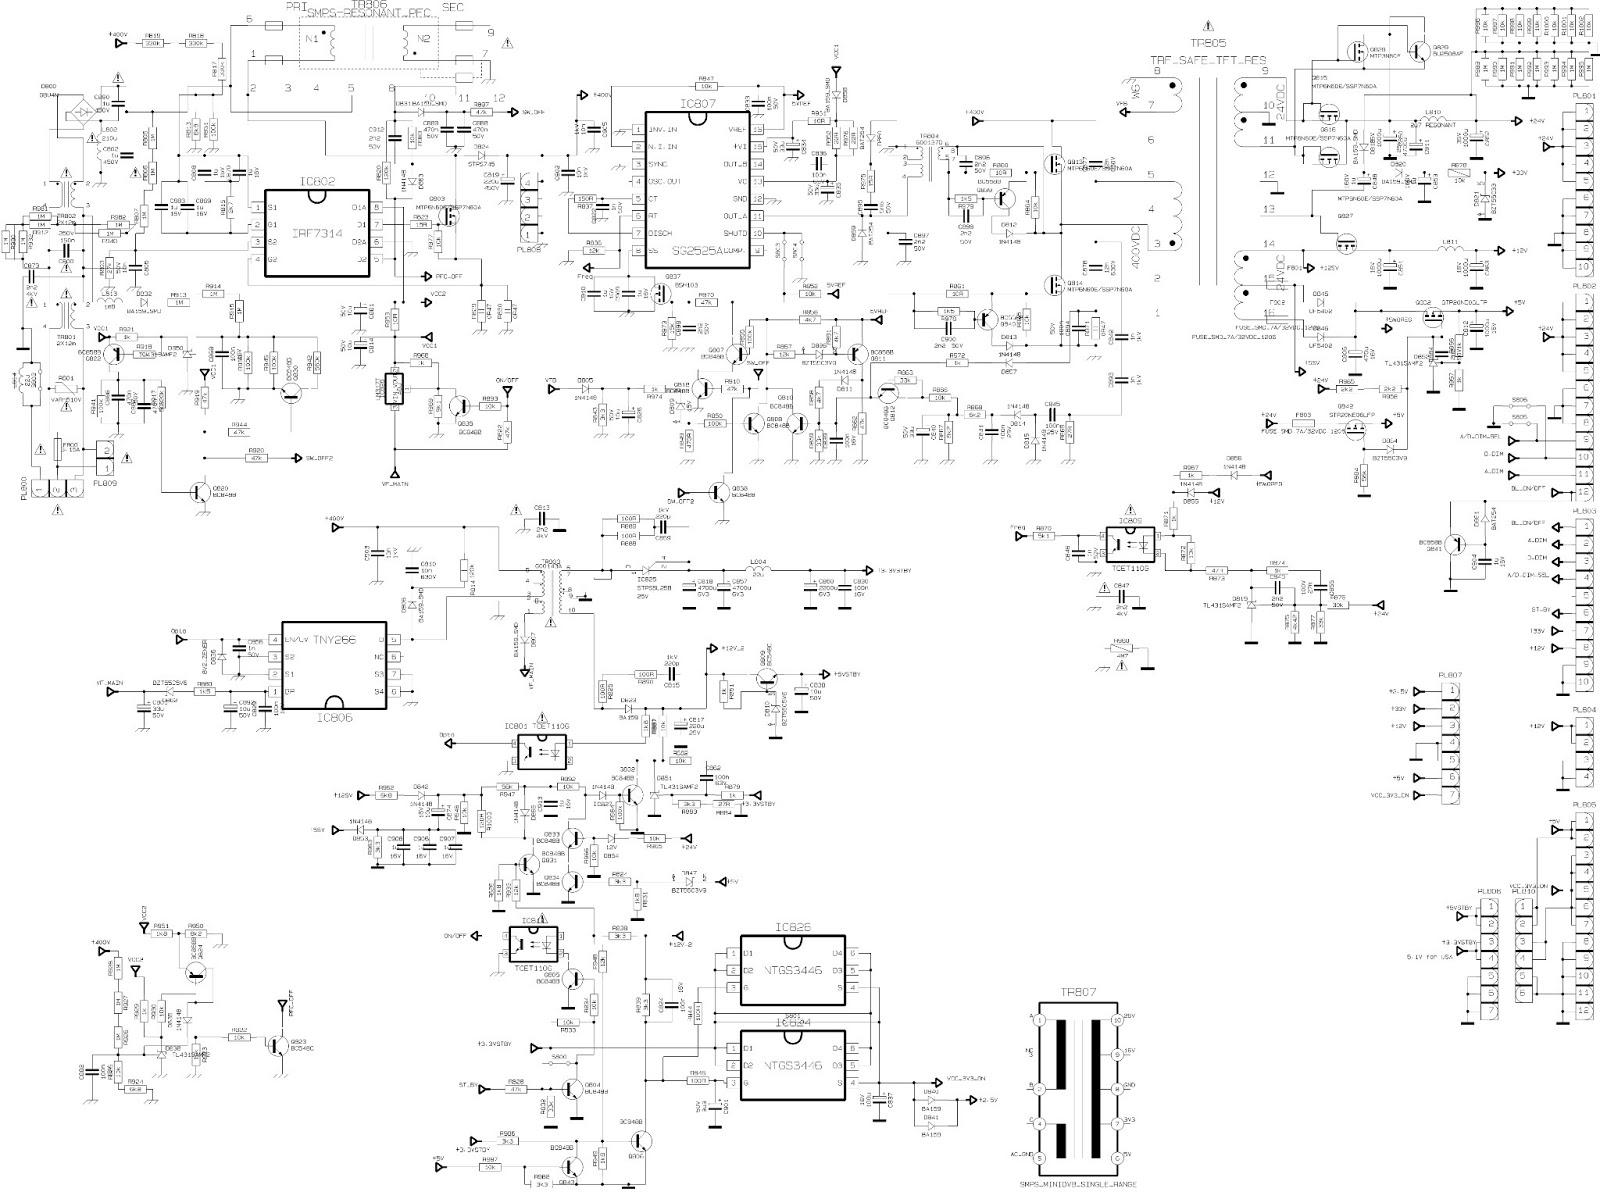 17pw15 8 Circuit Diagram Schematic Diagrams 17pw26 4 Vestel 17pw20 Power Supply Smps Schematics